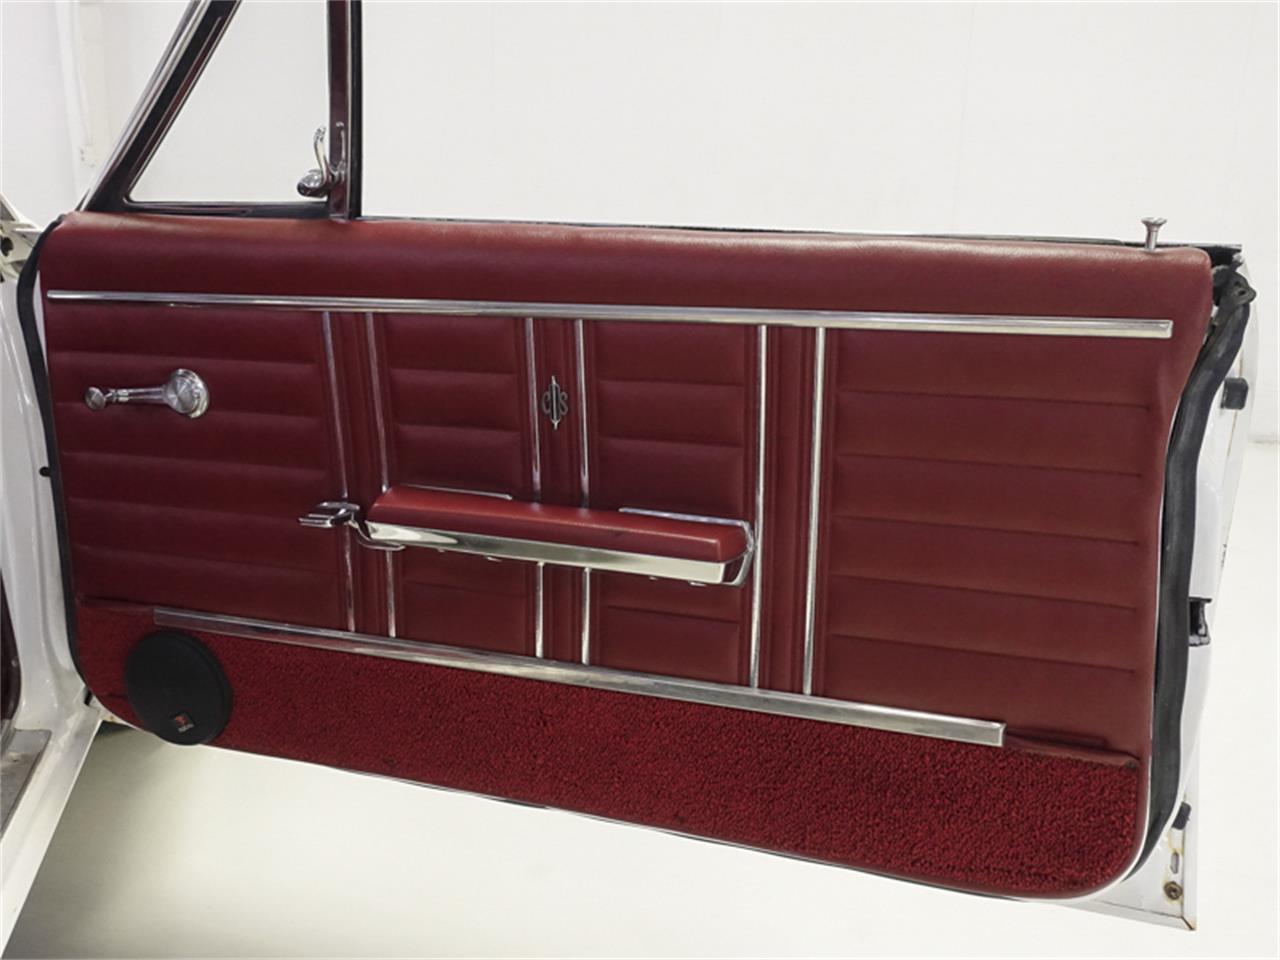 Large Picture of Classic 1967 Oldsmobile Cutlass Supreme located in Saint Louis Missouri - $29,900.00 - QK0F